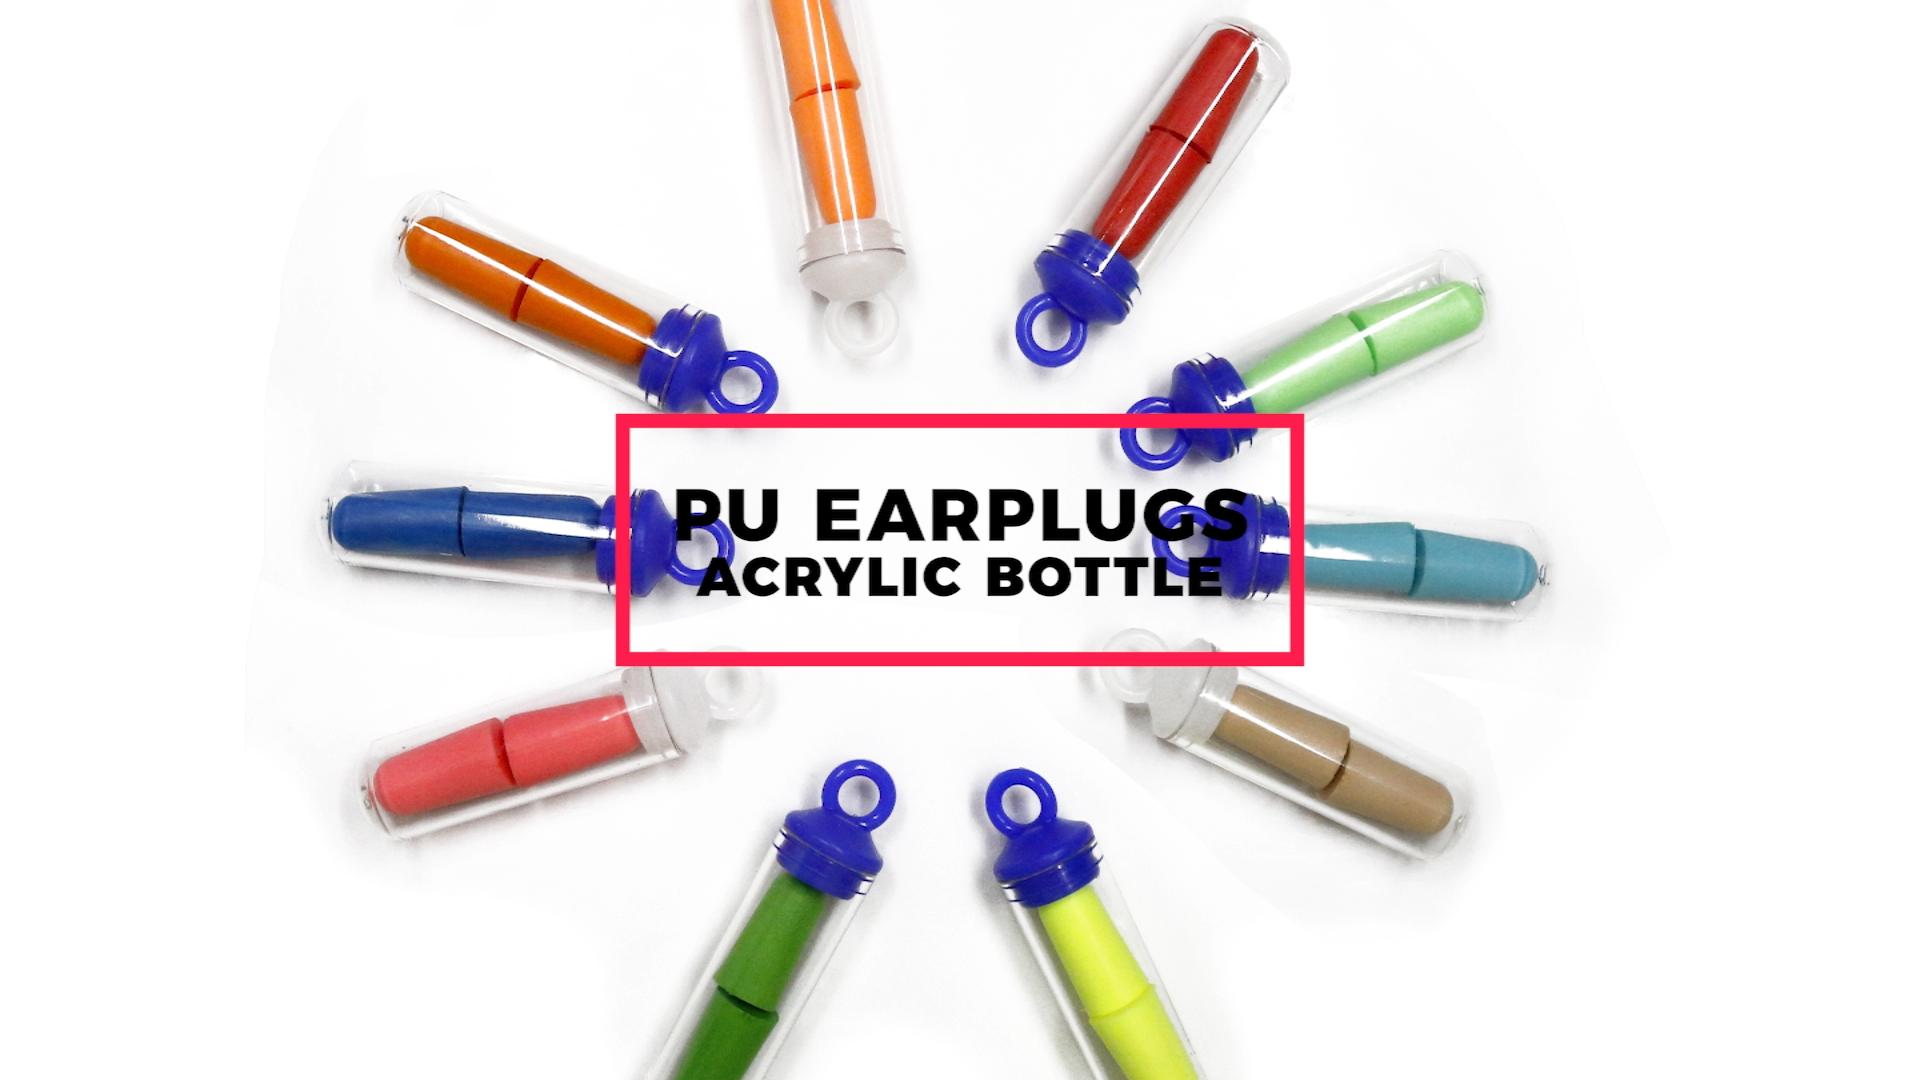 38dB OEM/ODM snorig PU foam earplugs for noise reduction with plastic bottle